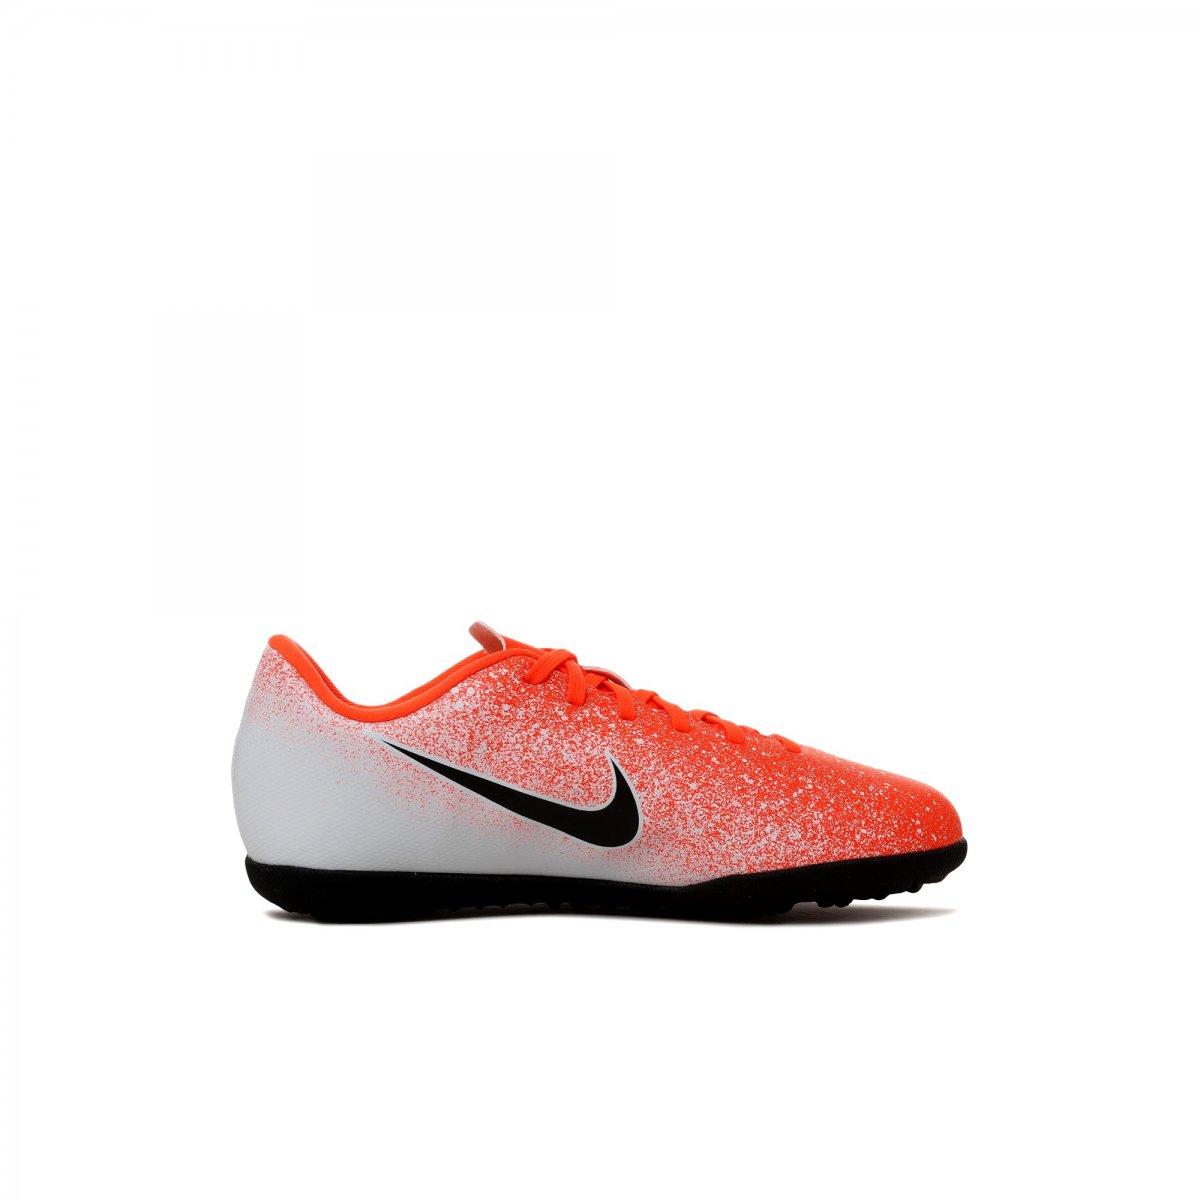 Leer total Redada  Chuteira Society Nike MercurialX Vapor XII Club Jr Infantil AH7355-801 -  Laranja/Branco - Botas Online Femininas, Masculinas e Infantis    Mundodasbotas.com.br